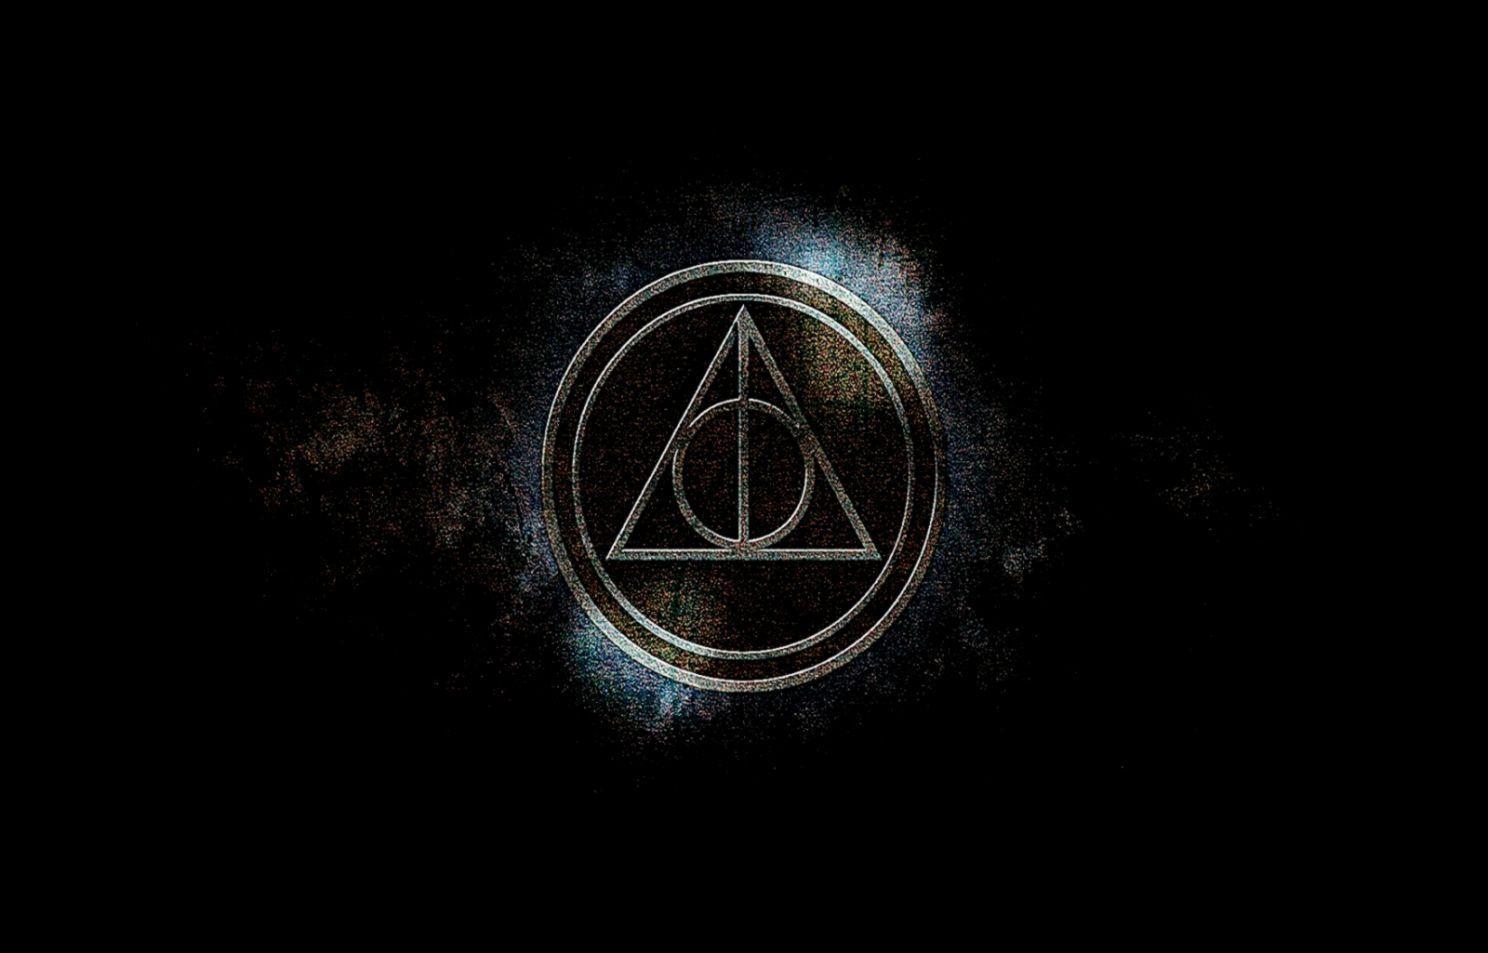 Best Harry Potter Wallpapers - Top Free Best Harry Potter ...